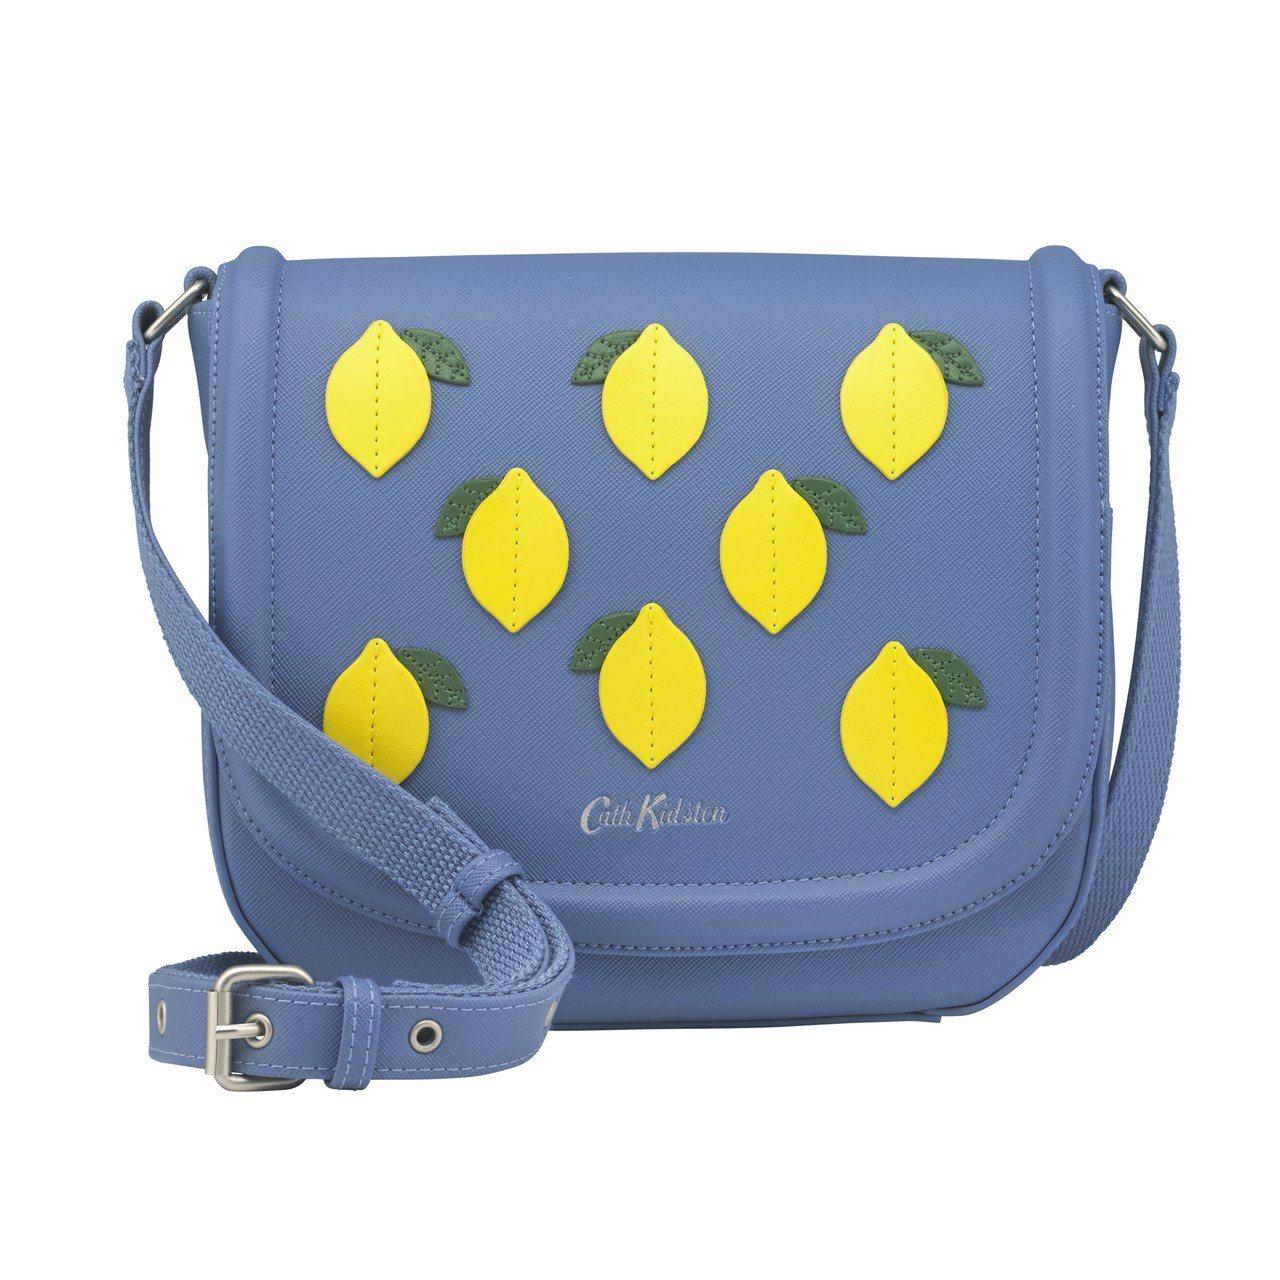 小檸檬側背小包,2,980元。圖/Cath Kidston提供